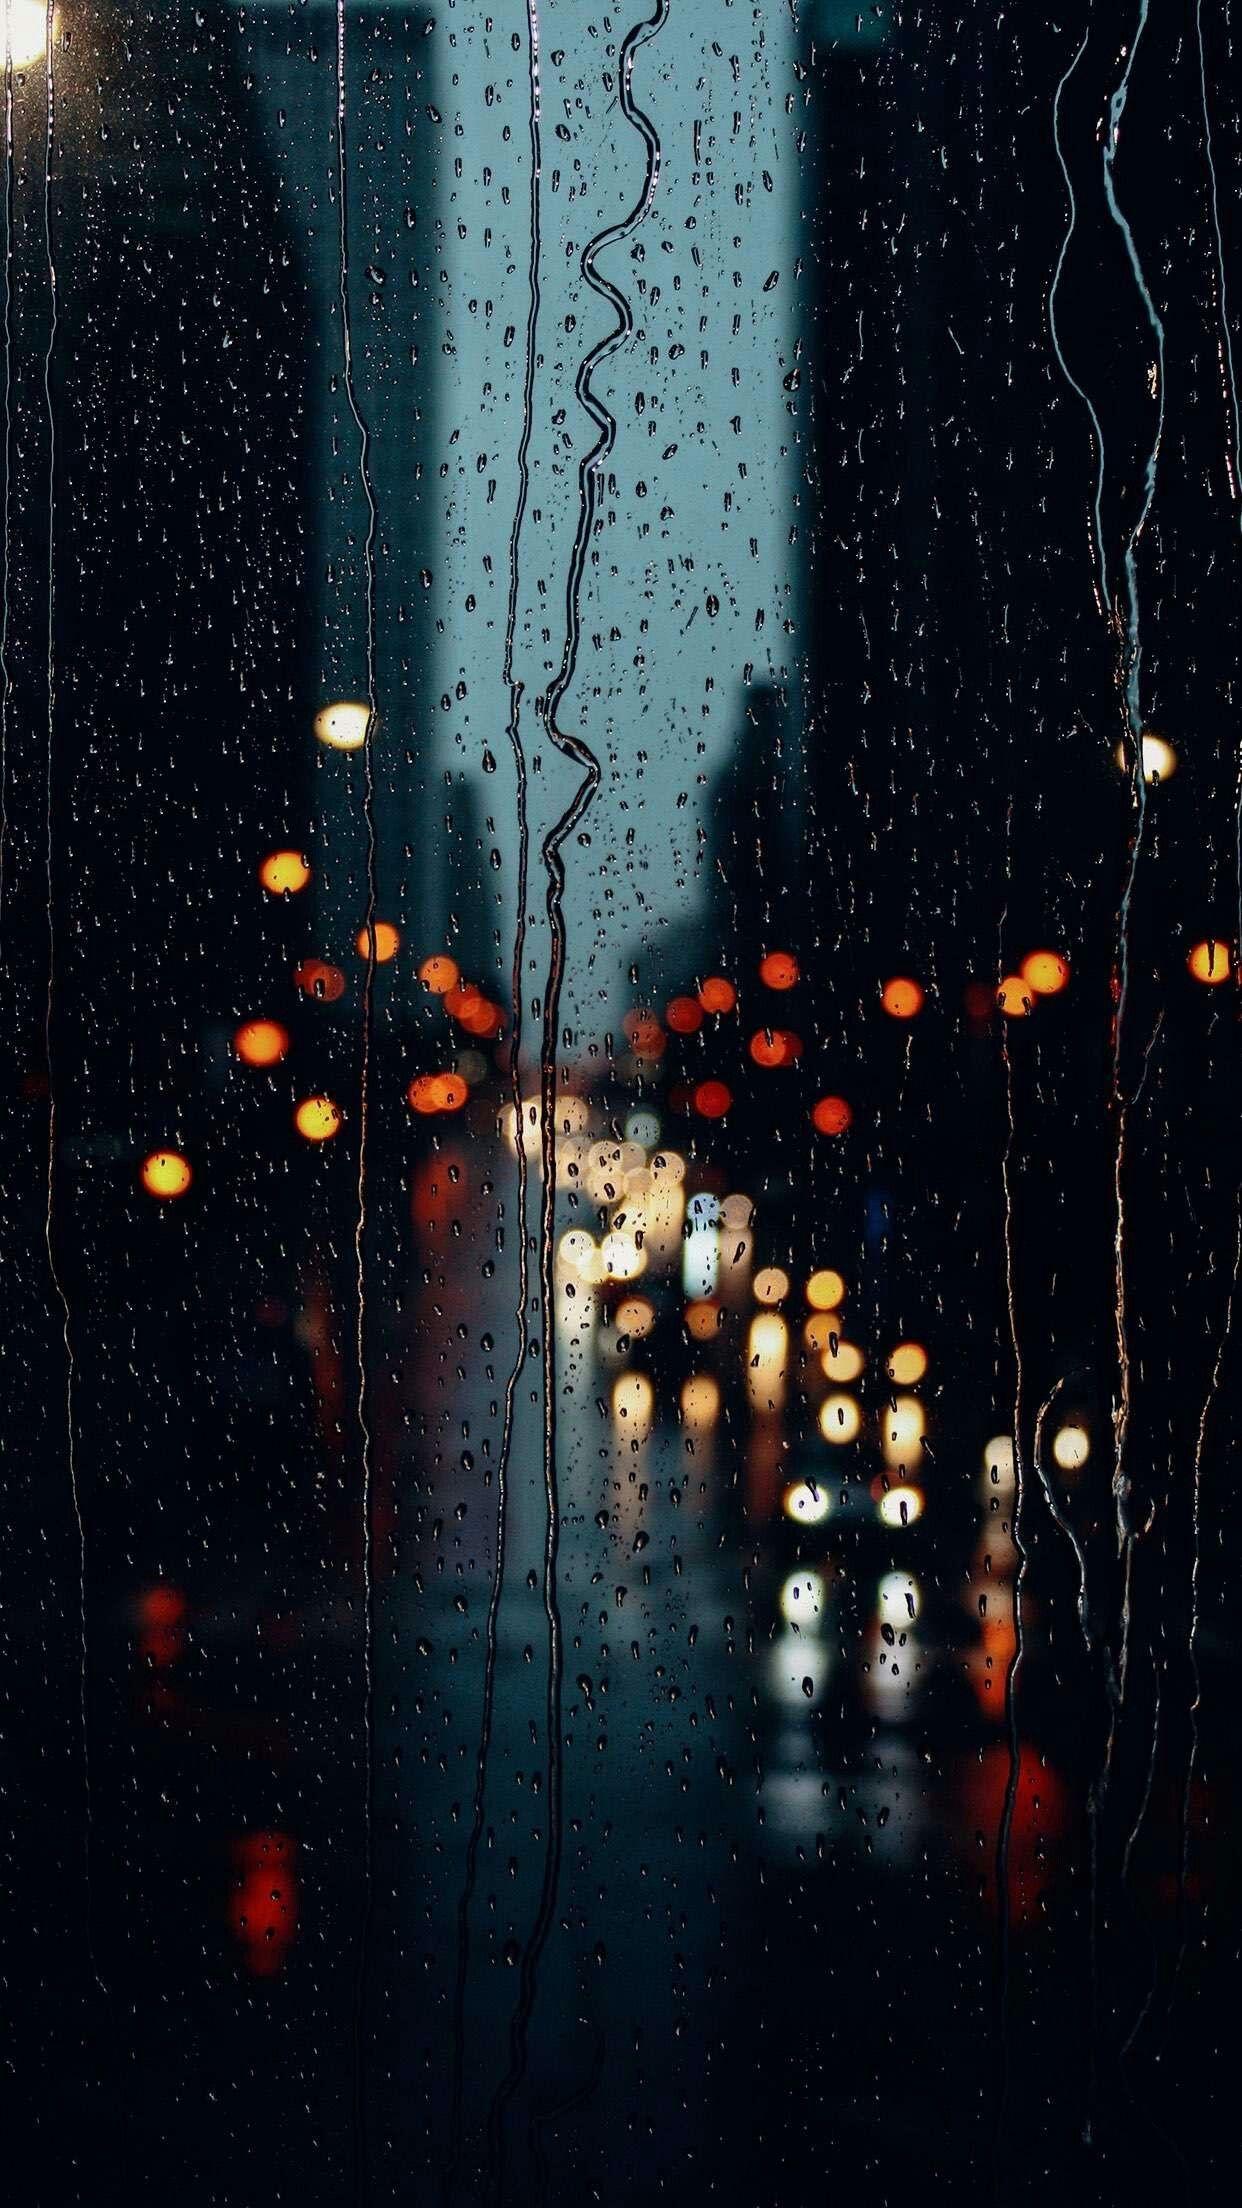 Pin by Annemariebronk on Rain Rainy wallpaper Rain wallpapers 1242x2208